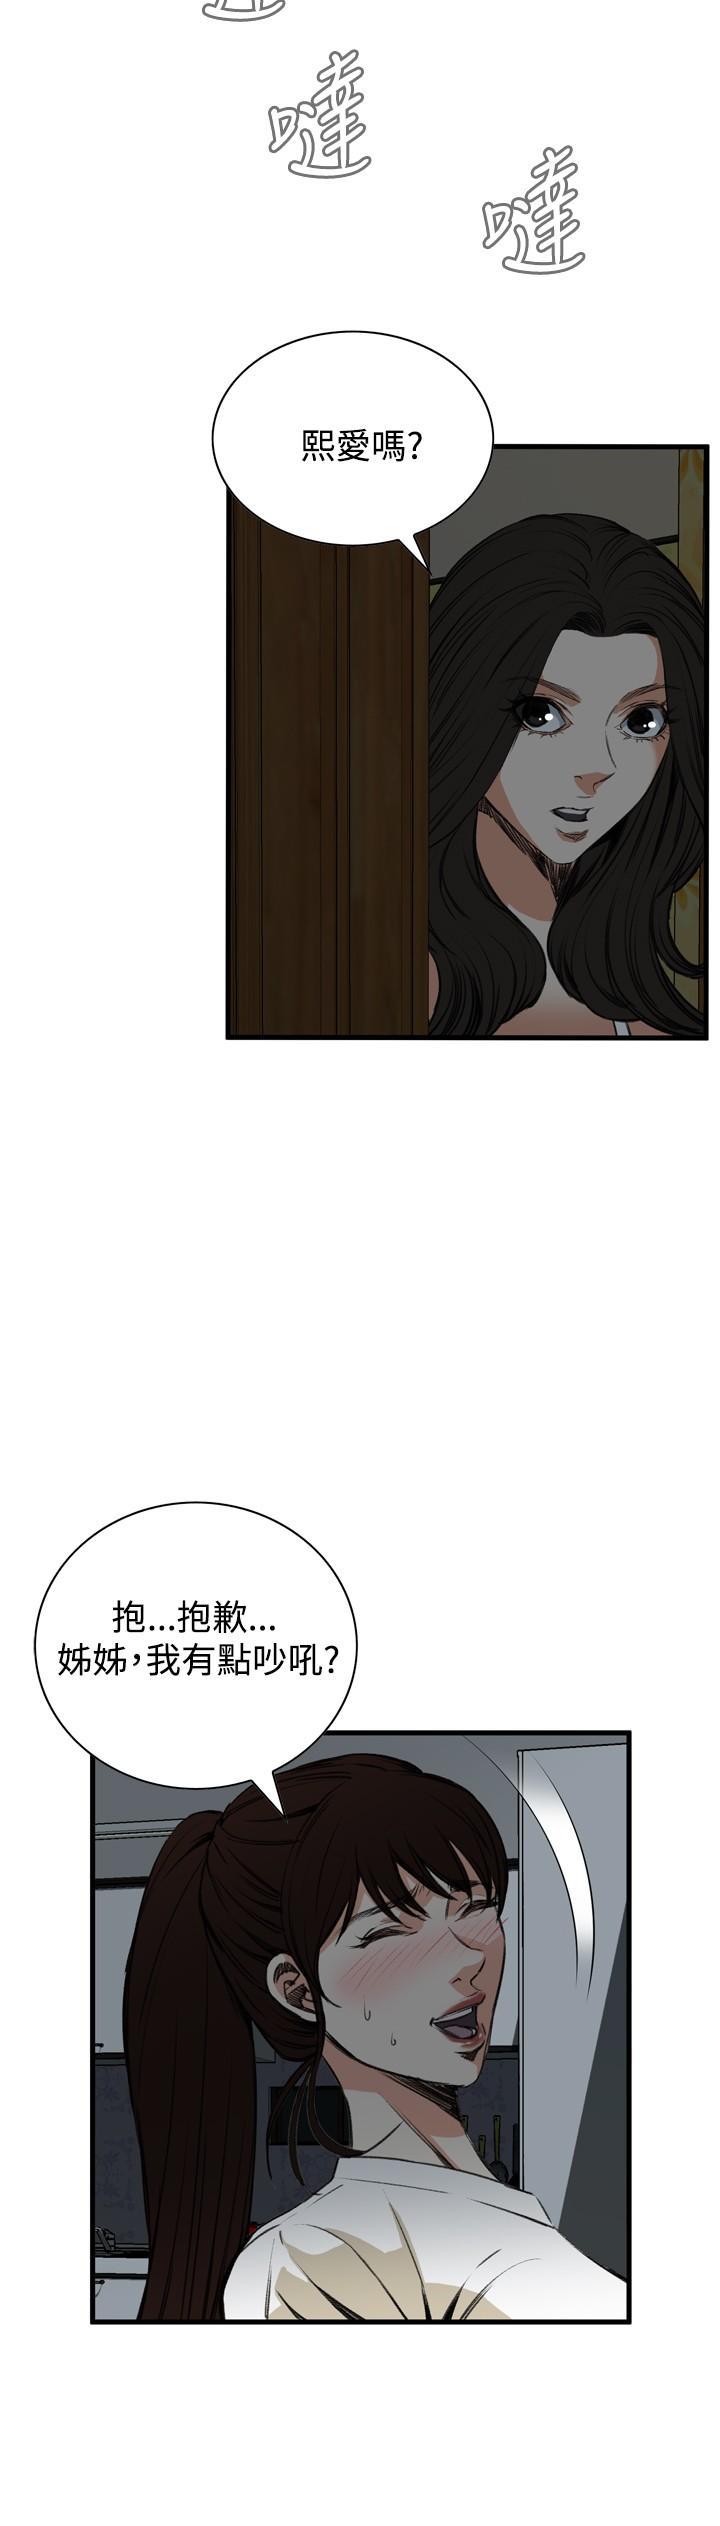 Take a Peek 偷窥 Ch.39~55 [Chinese]中文 183